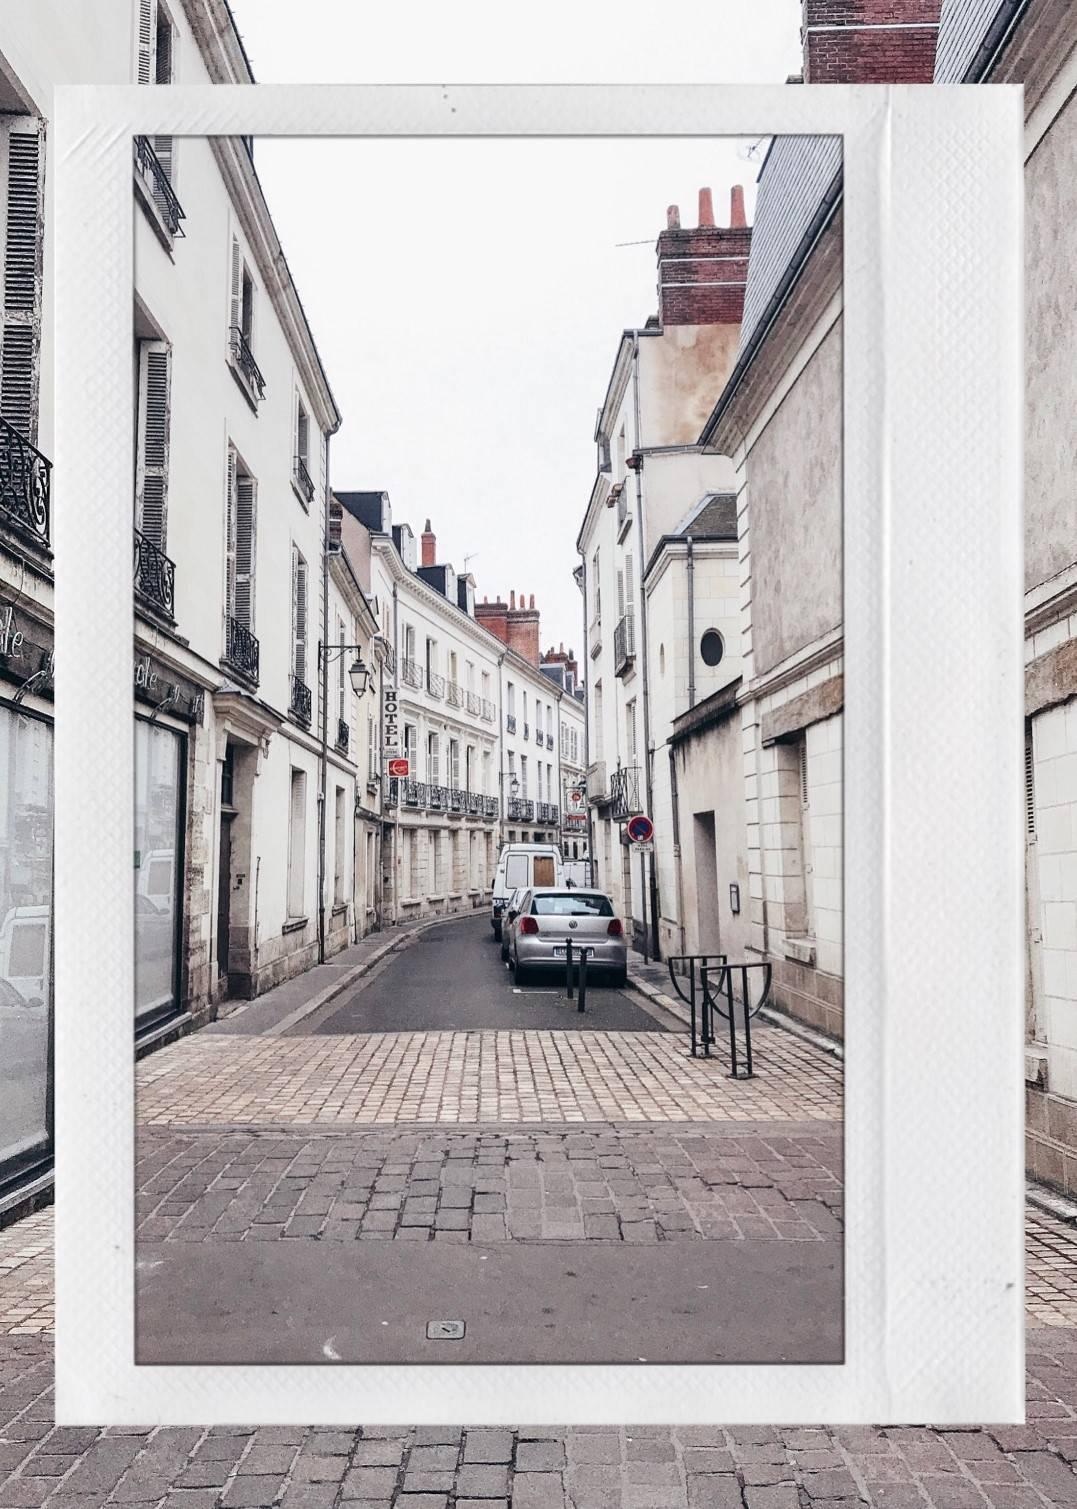 Planning a Roadtrip through France